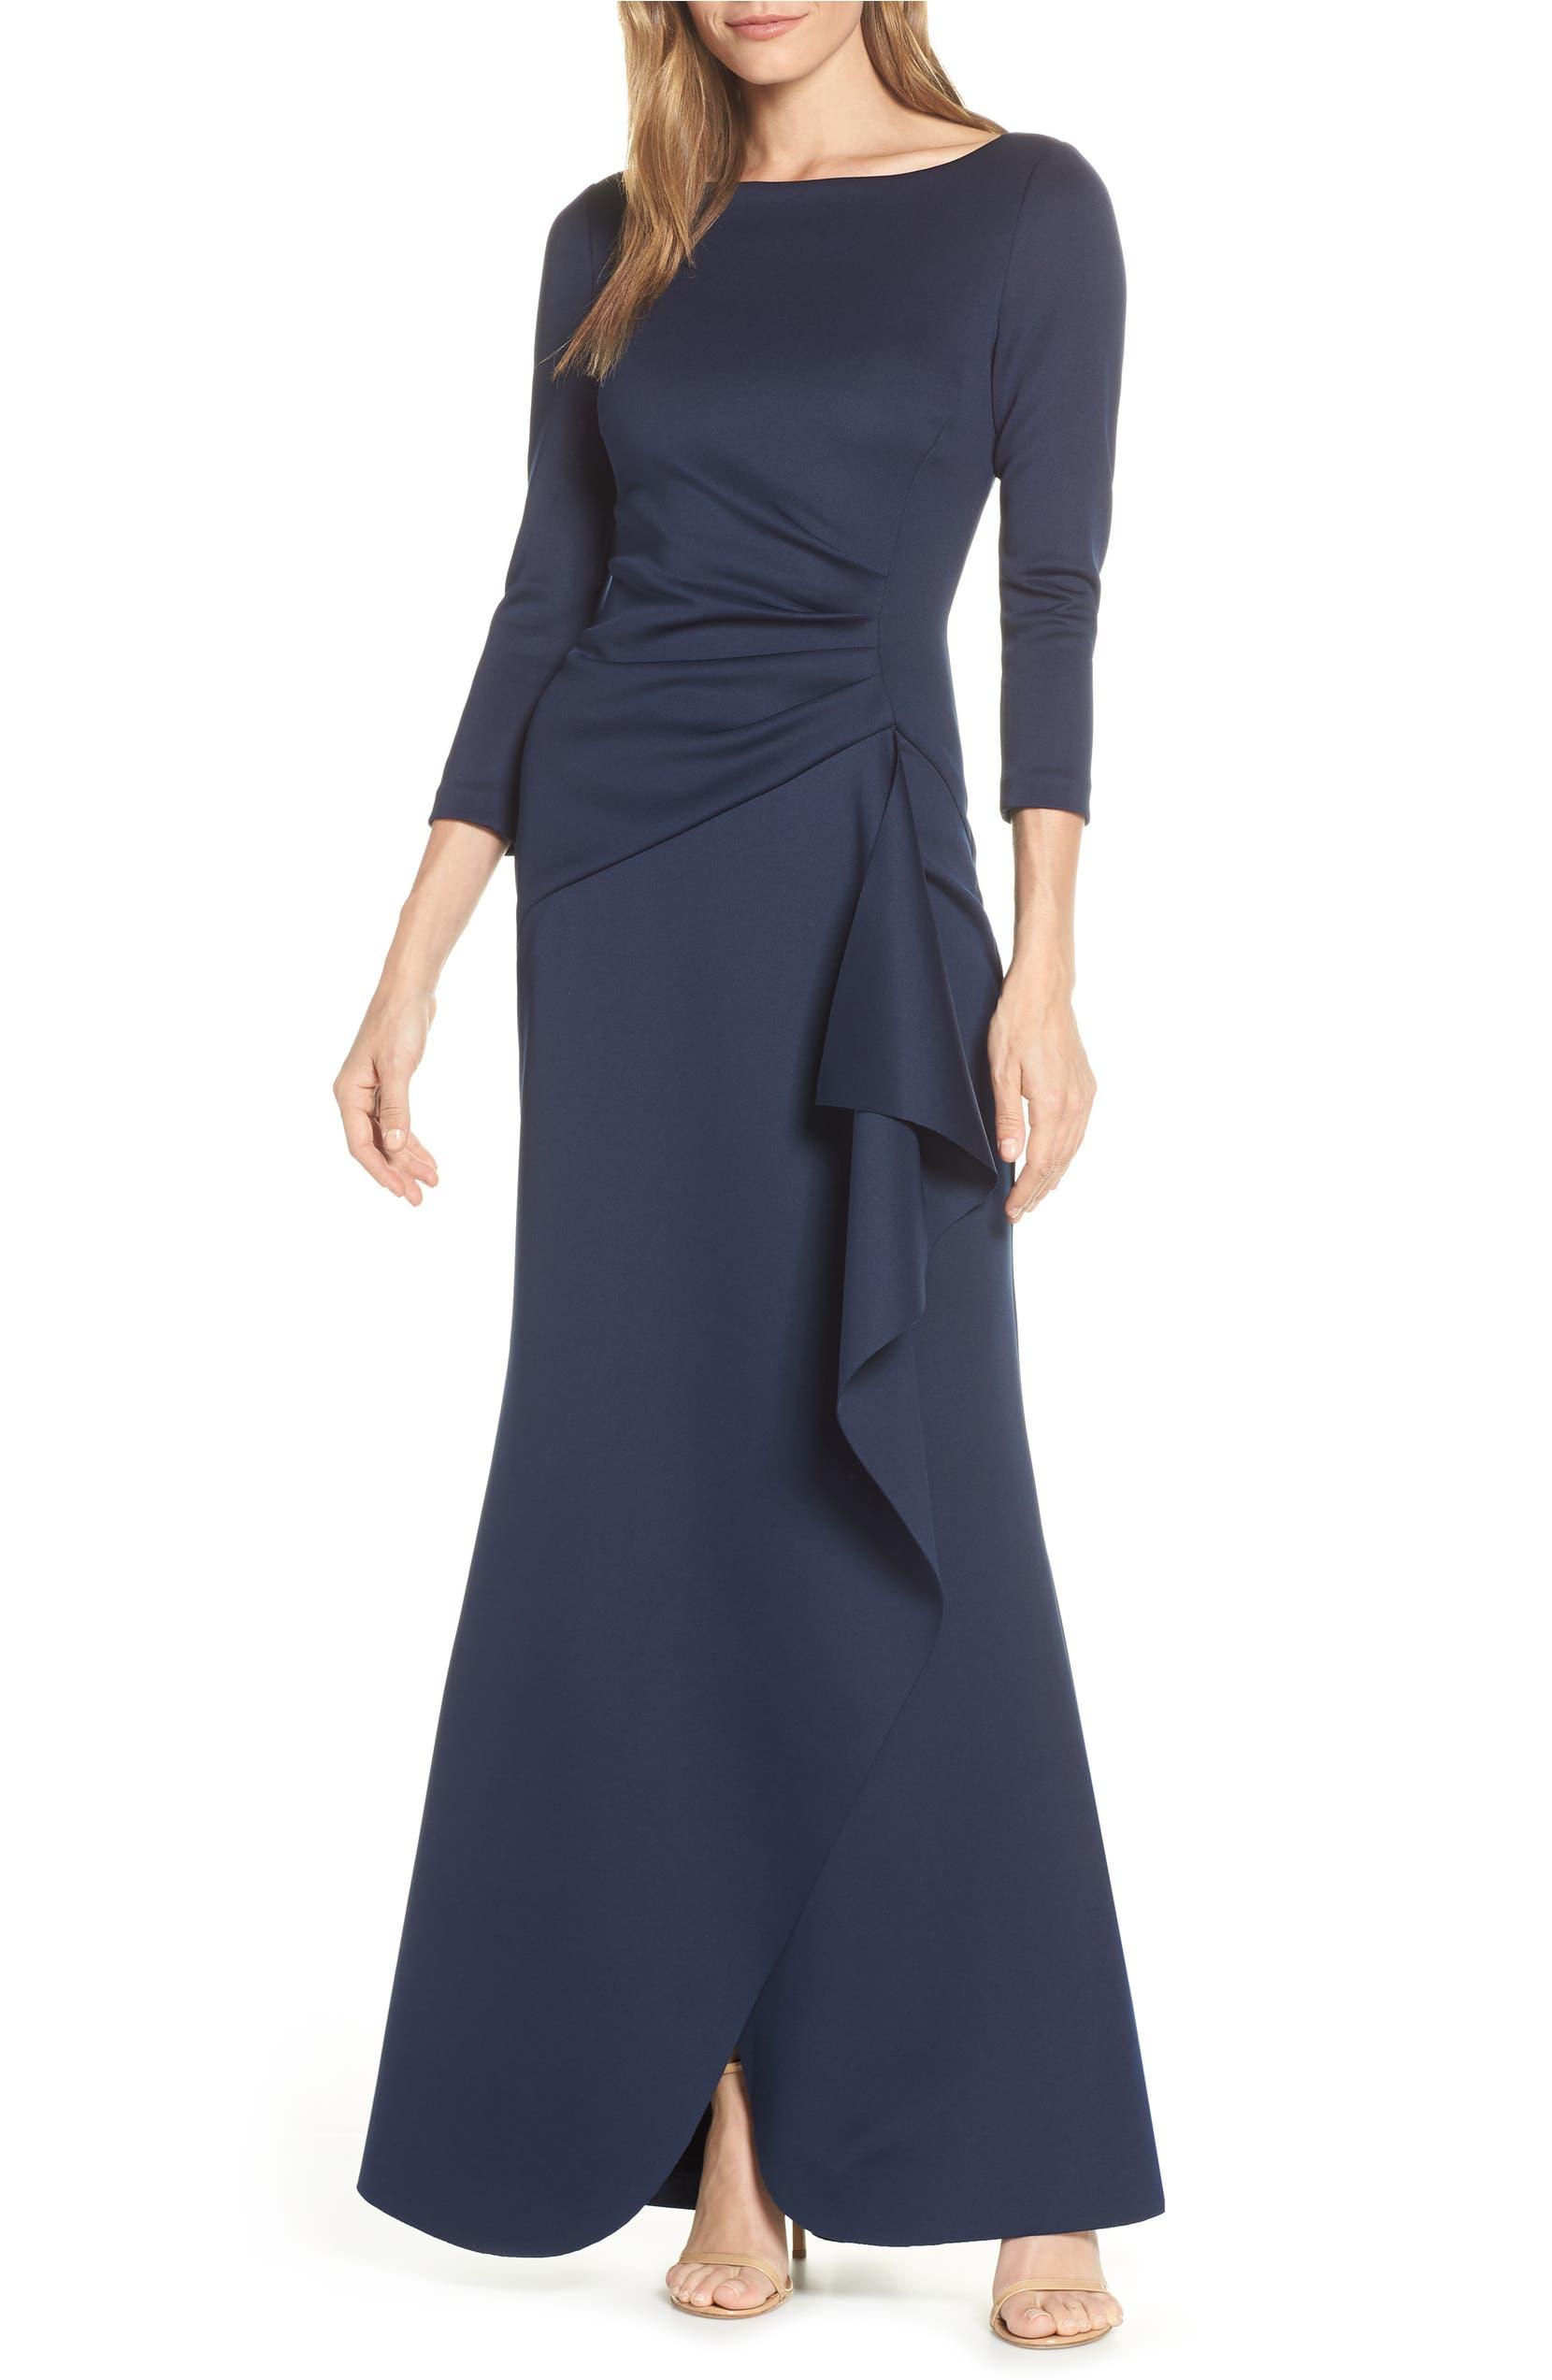 52fbf50ef476c Techno Scuba Pleat Evening Dress